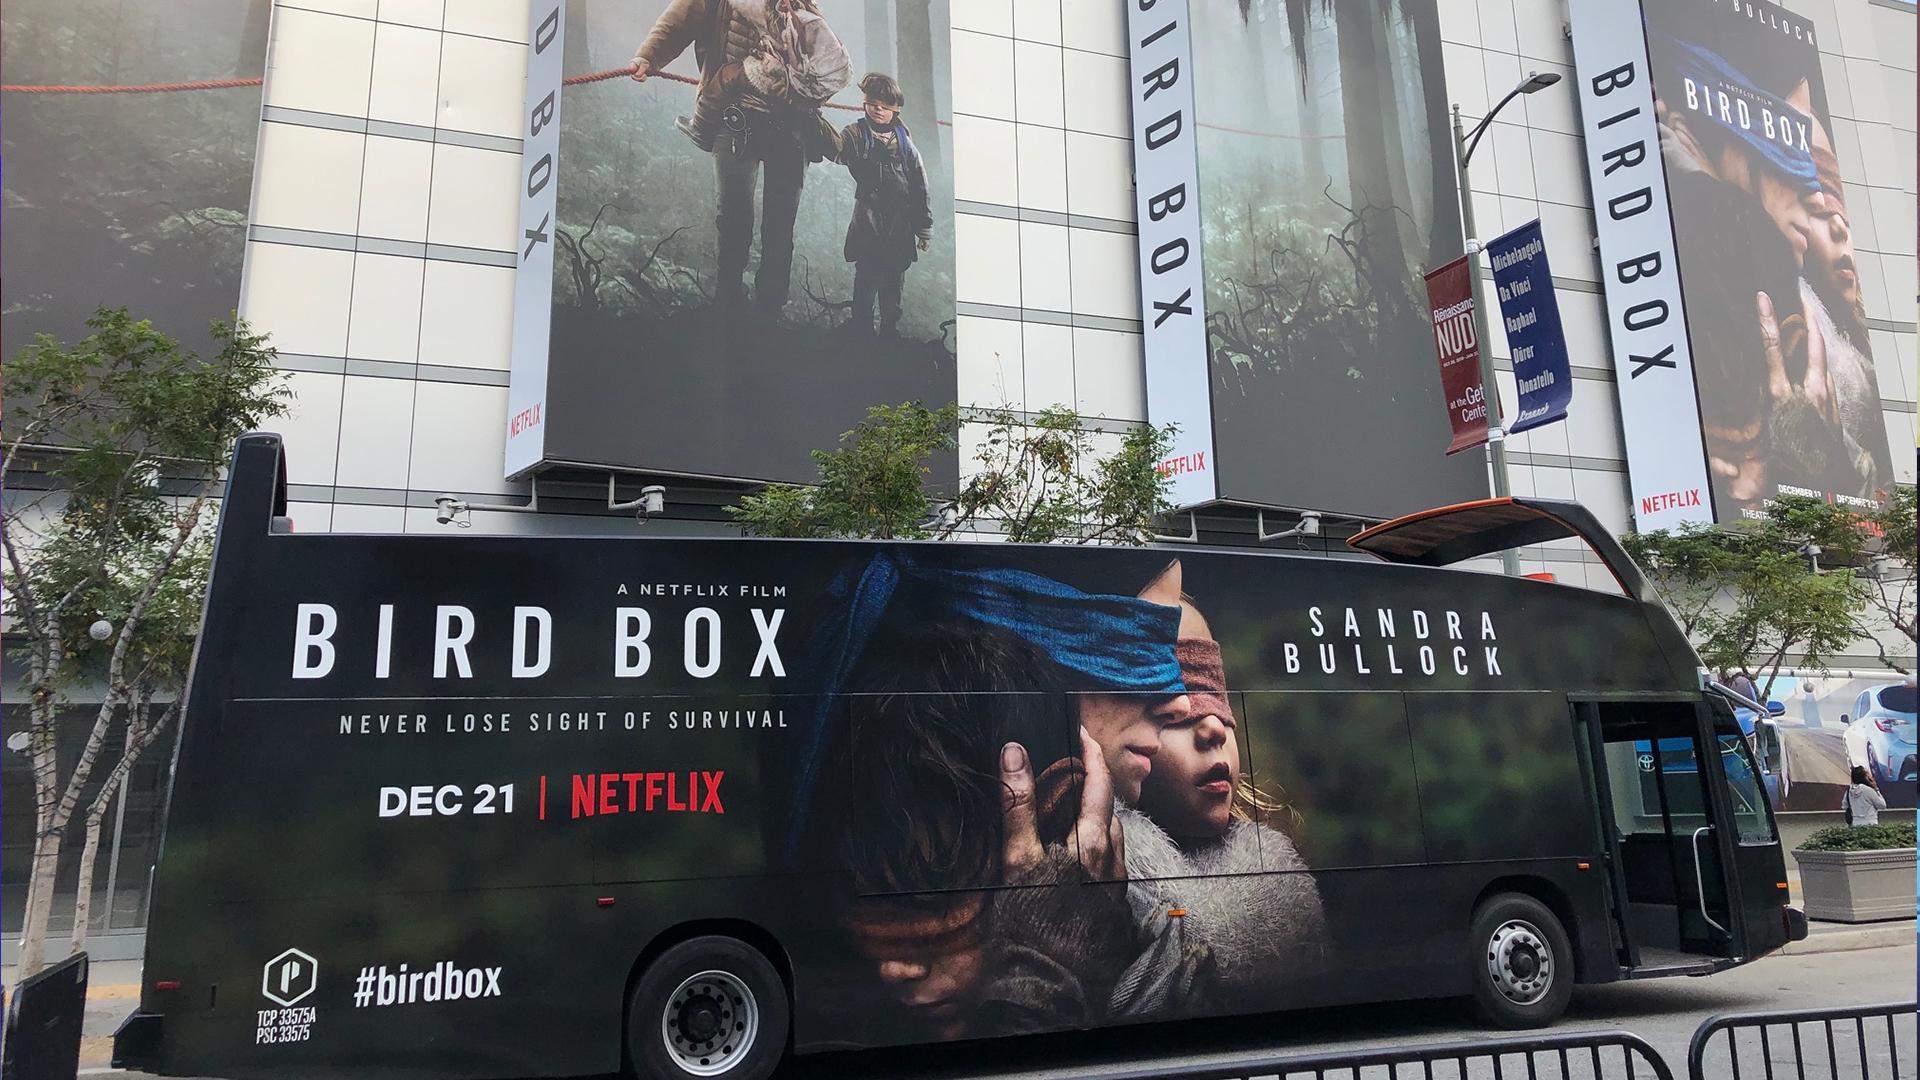 Netflix_BirdBox_bus